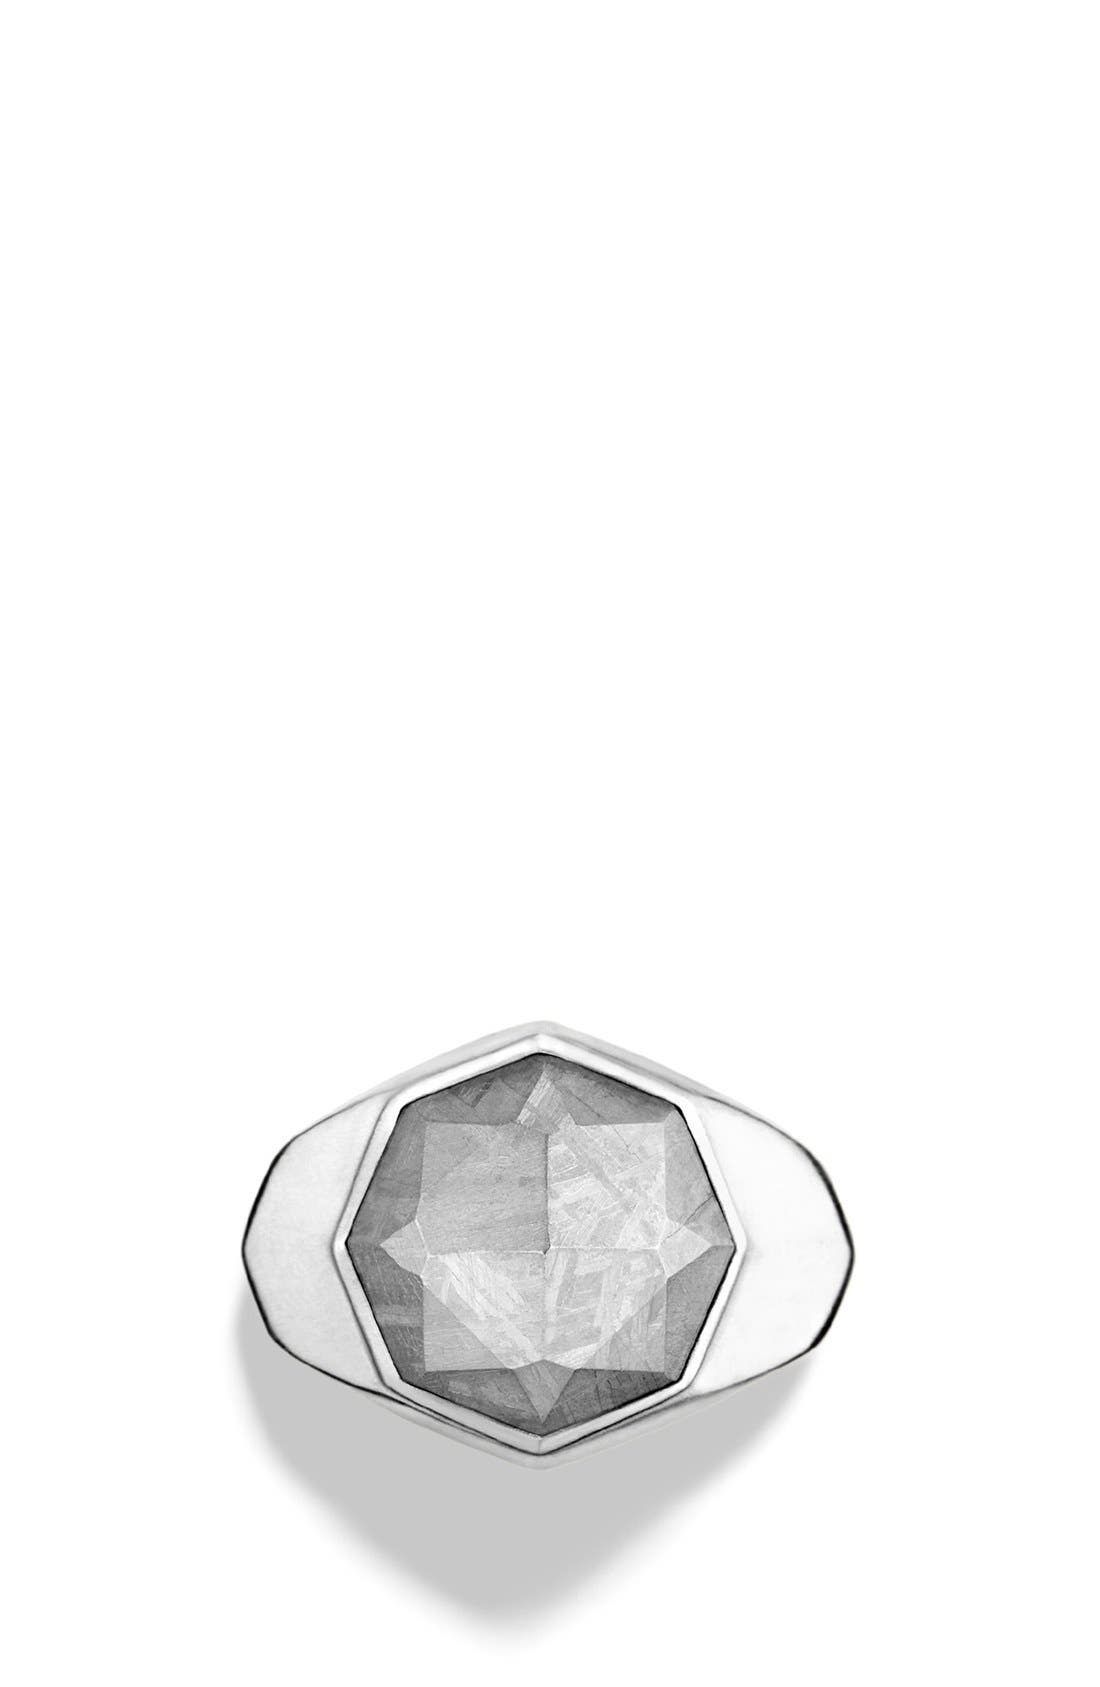 'Meteorite' Signet Ring,                             Alternate thumbnail 4, color,                             METEORITE